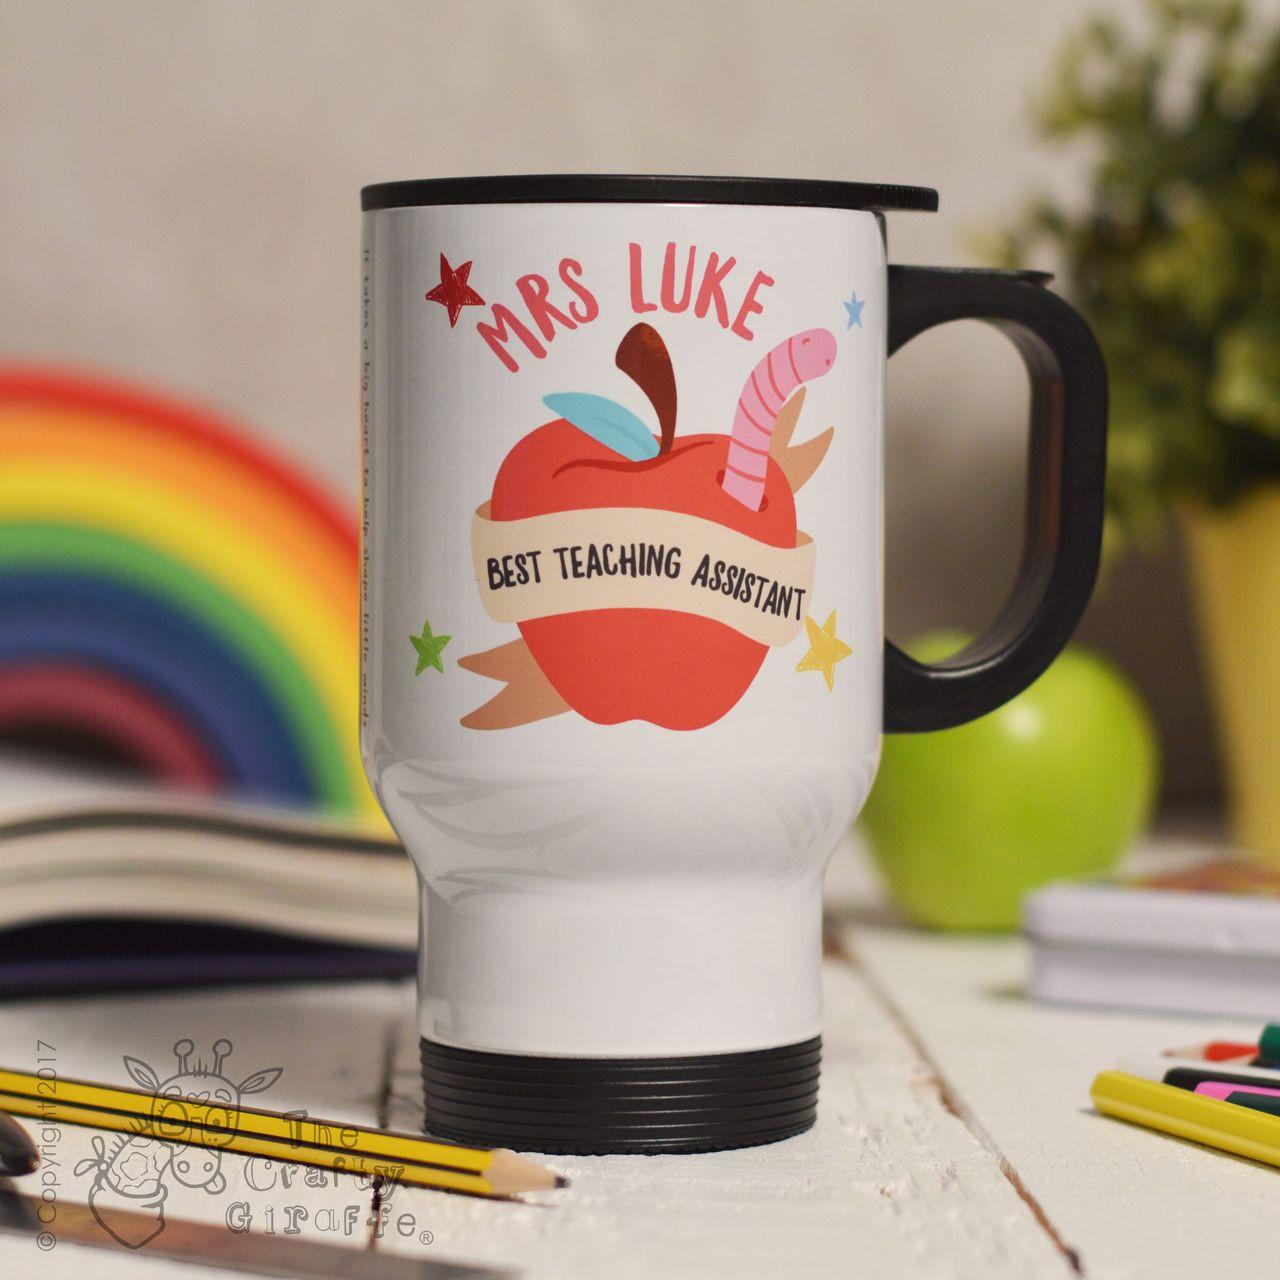 Personalised Best Teaching Assistant Travel Mug - The Crafty Giraffe